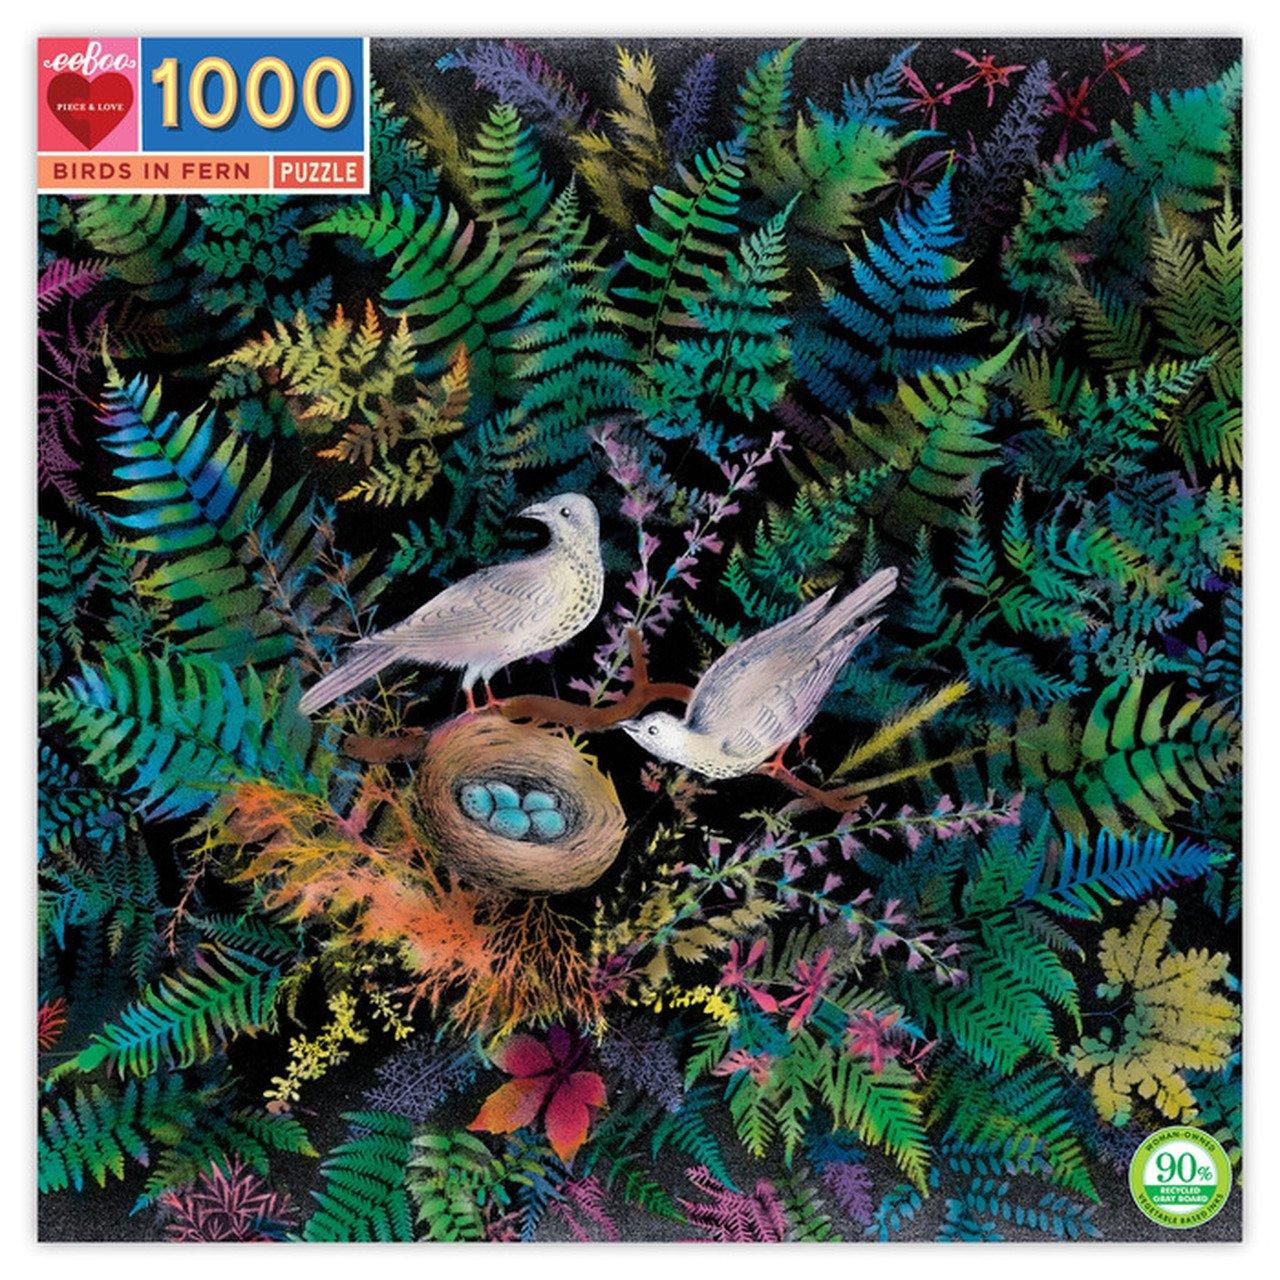 Birds in Fern 1000 Piece Puzzle by Eeboo